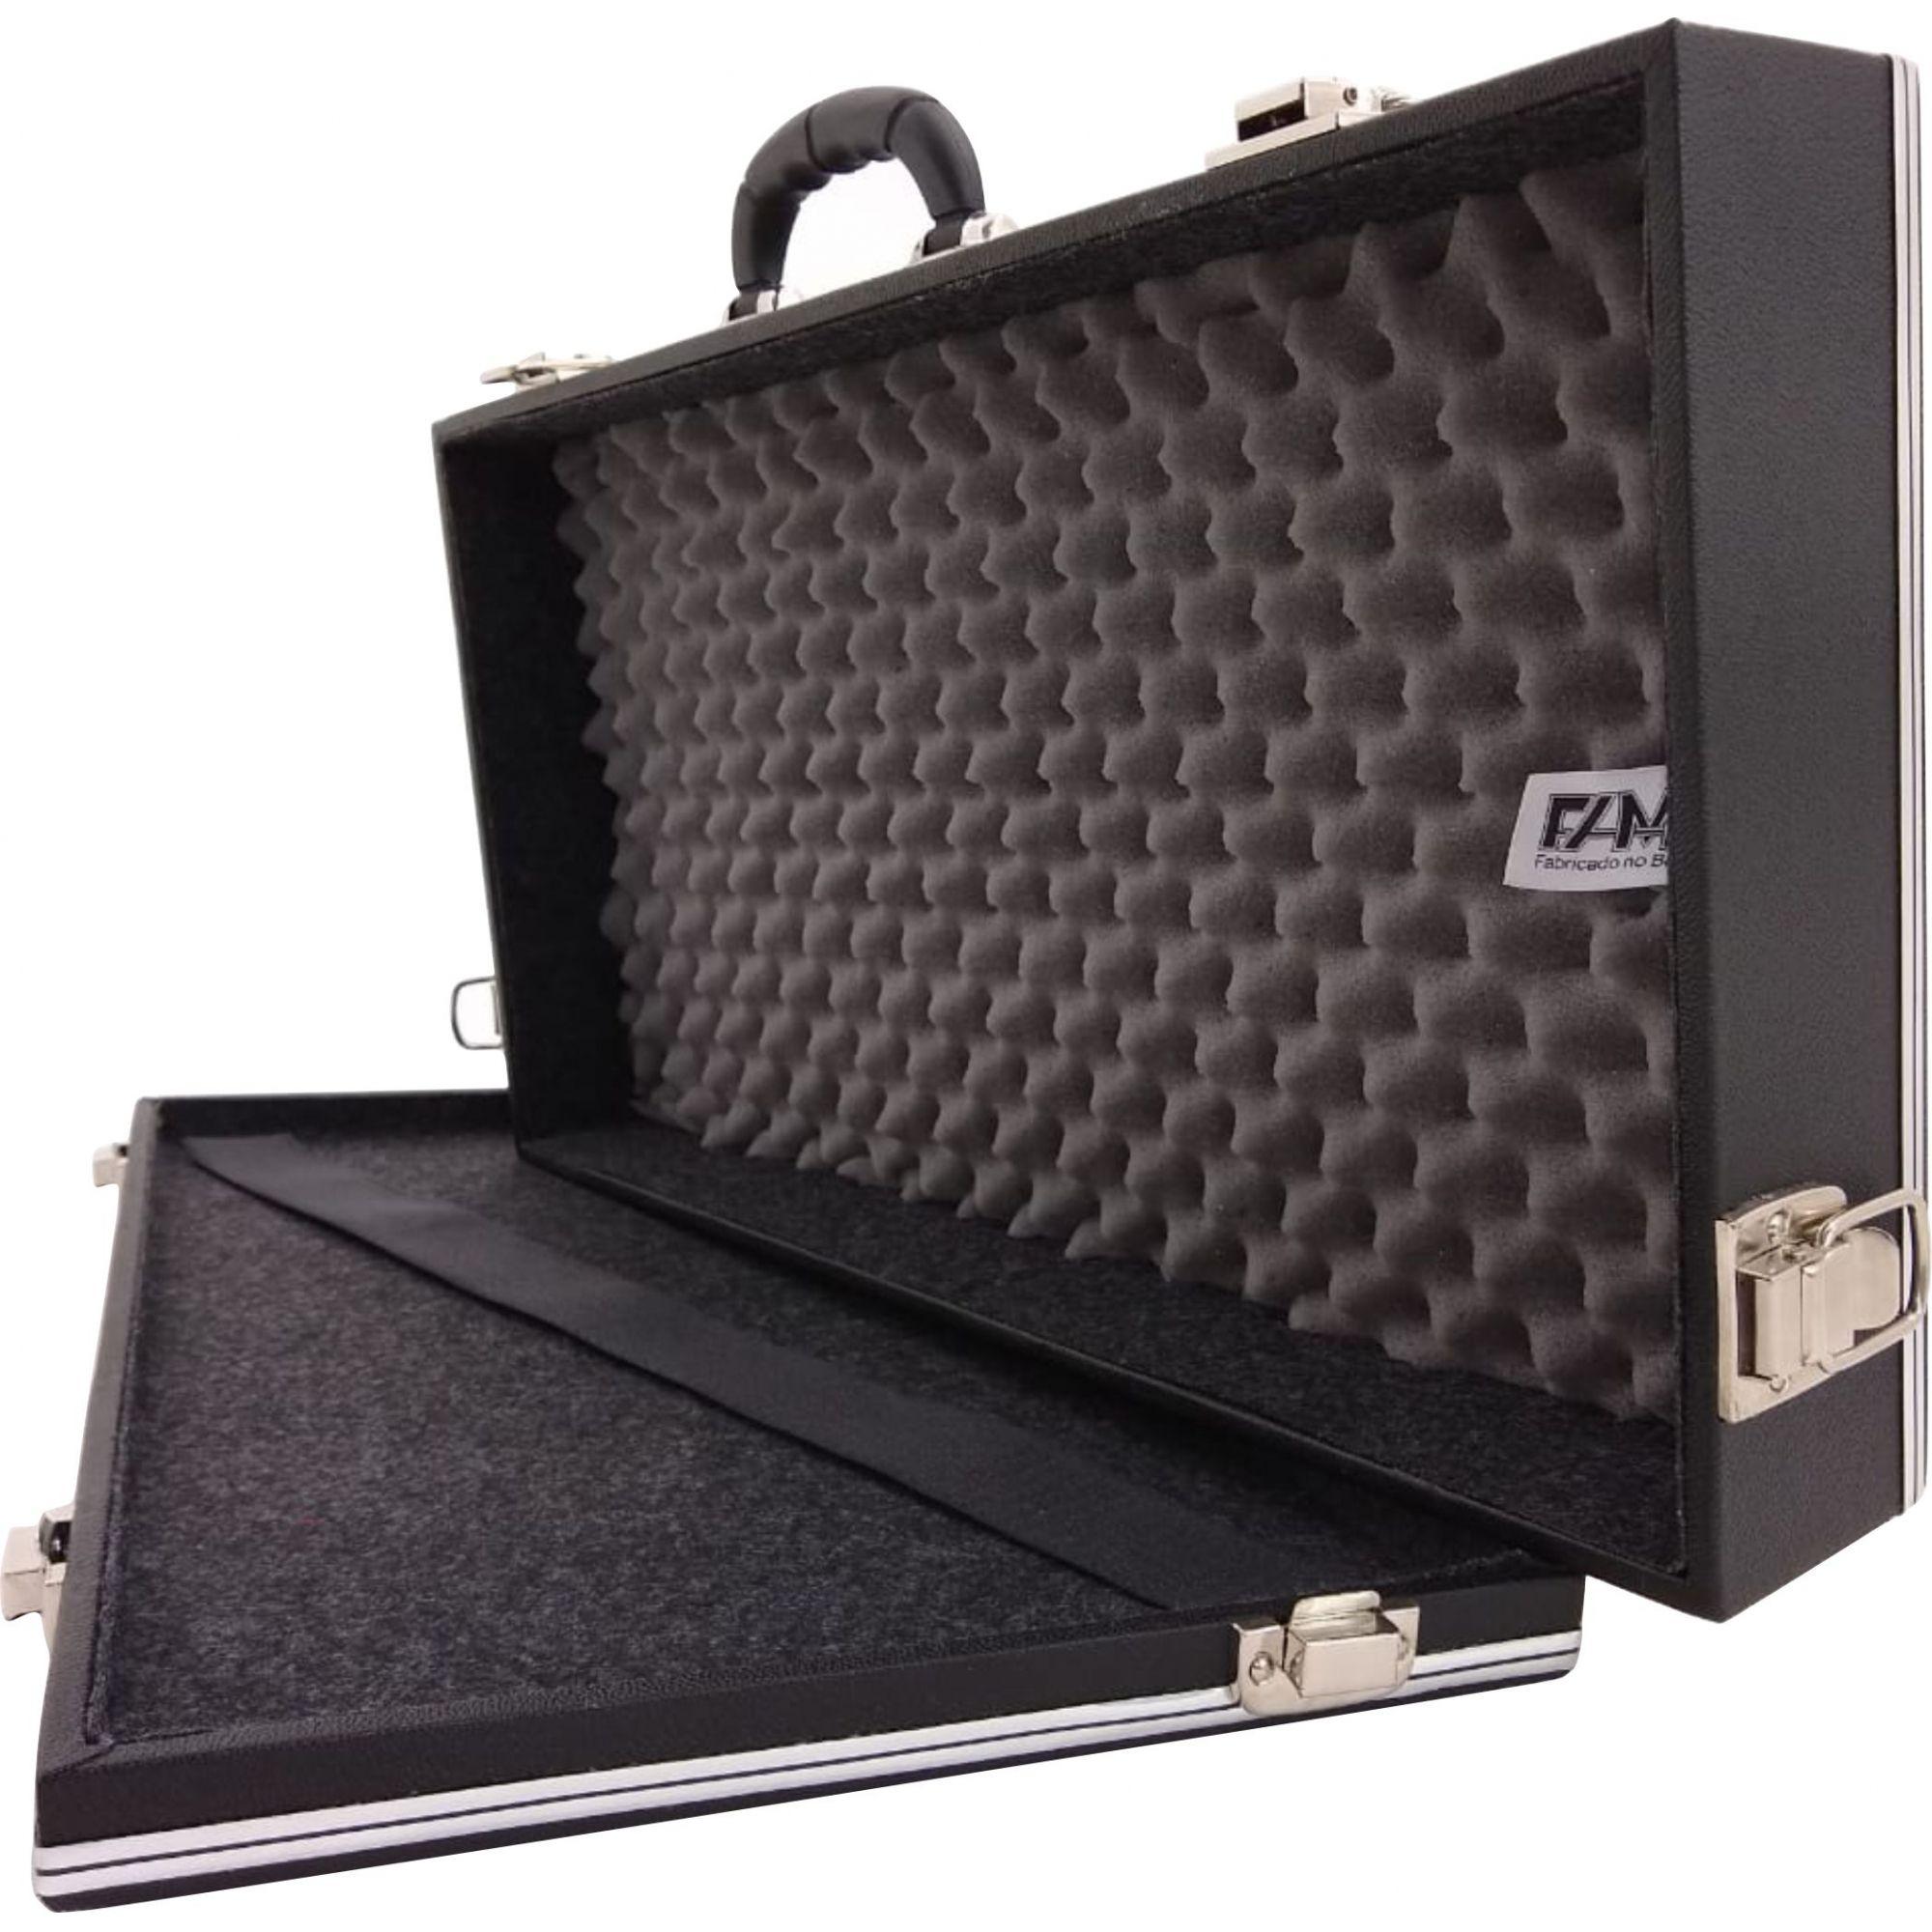 Case Para 4 (Quatro) Pedais Luxo